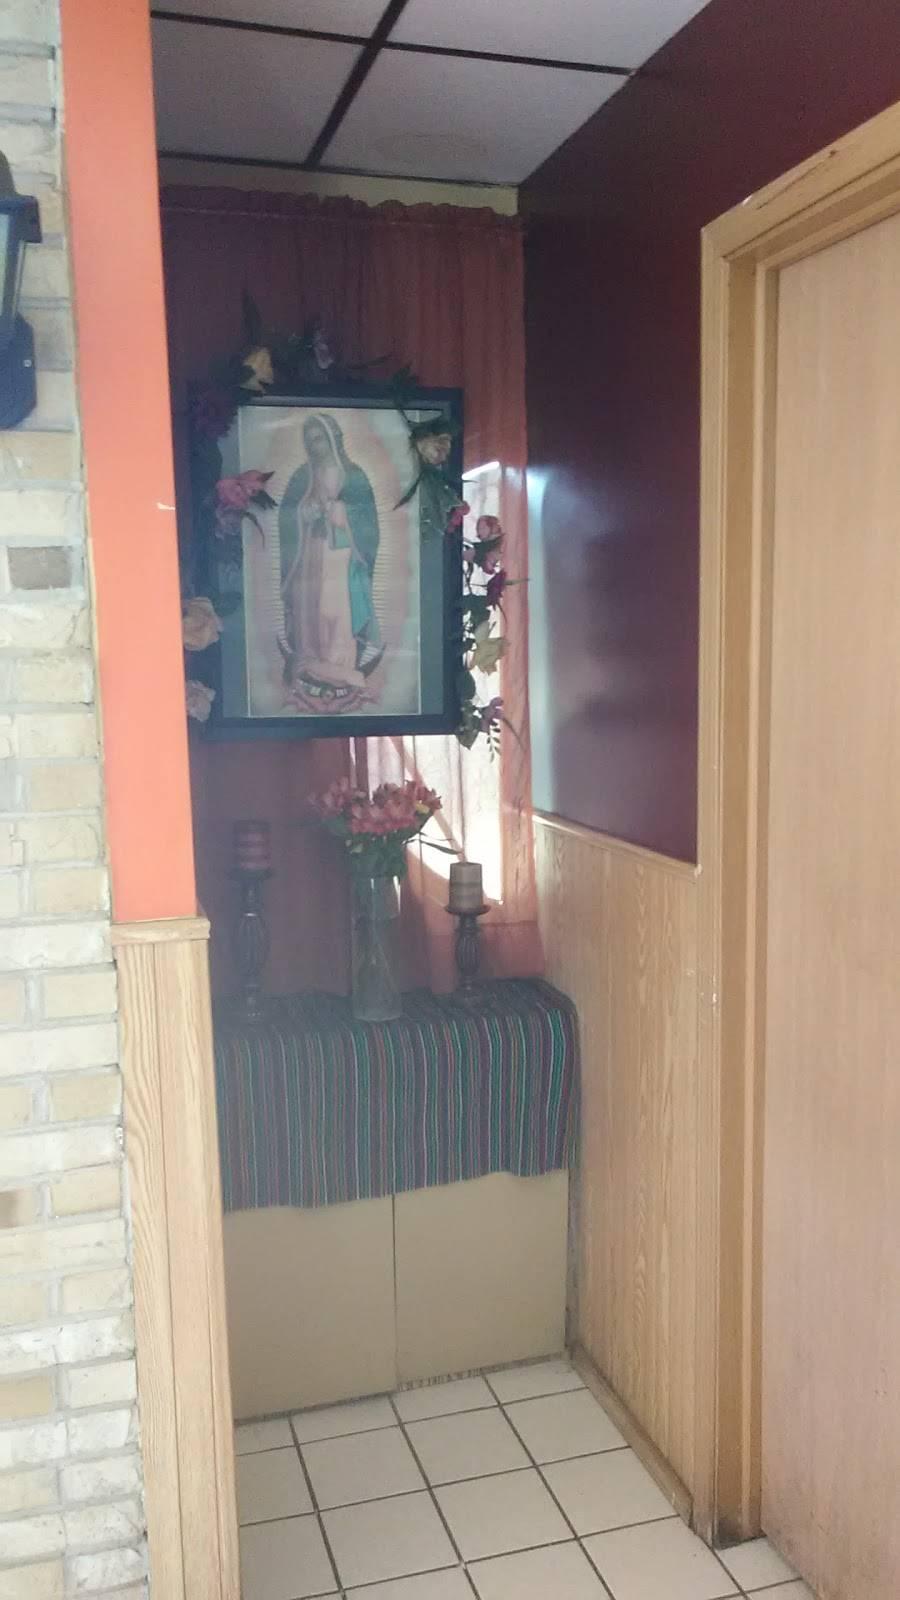 Taquería Jalisco | restaurant | 12259 Western Ave, Blue Island, IL 60406, USA | 7084895200 OR +1 708-489-5200